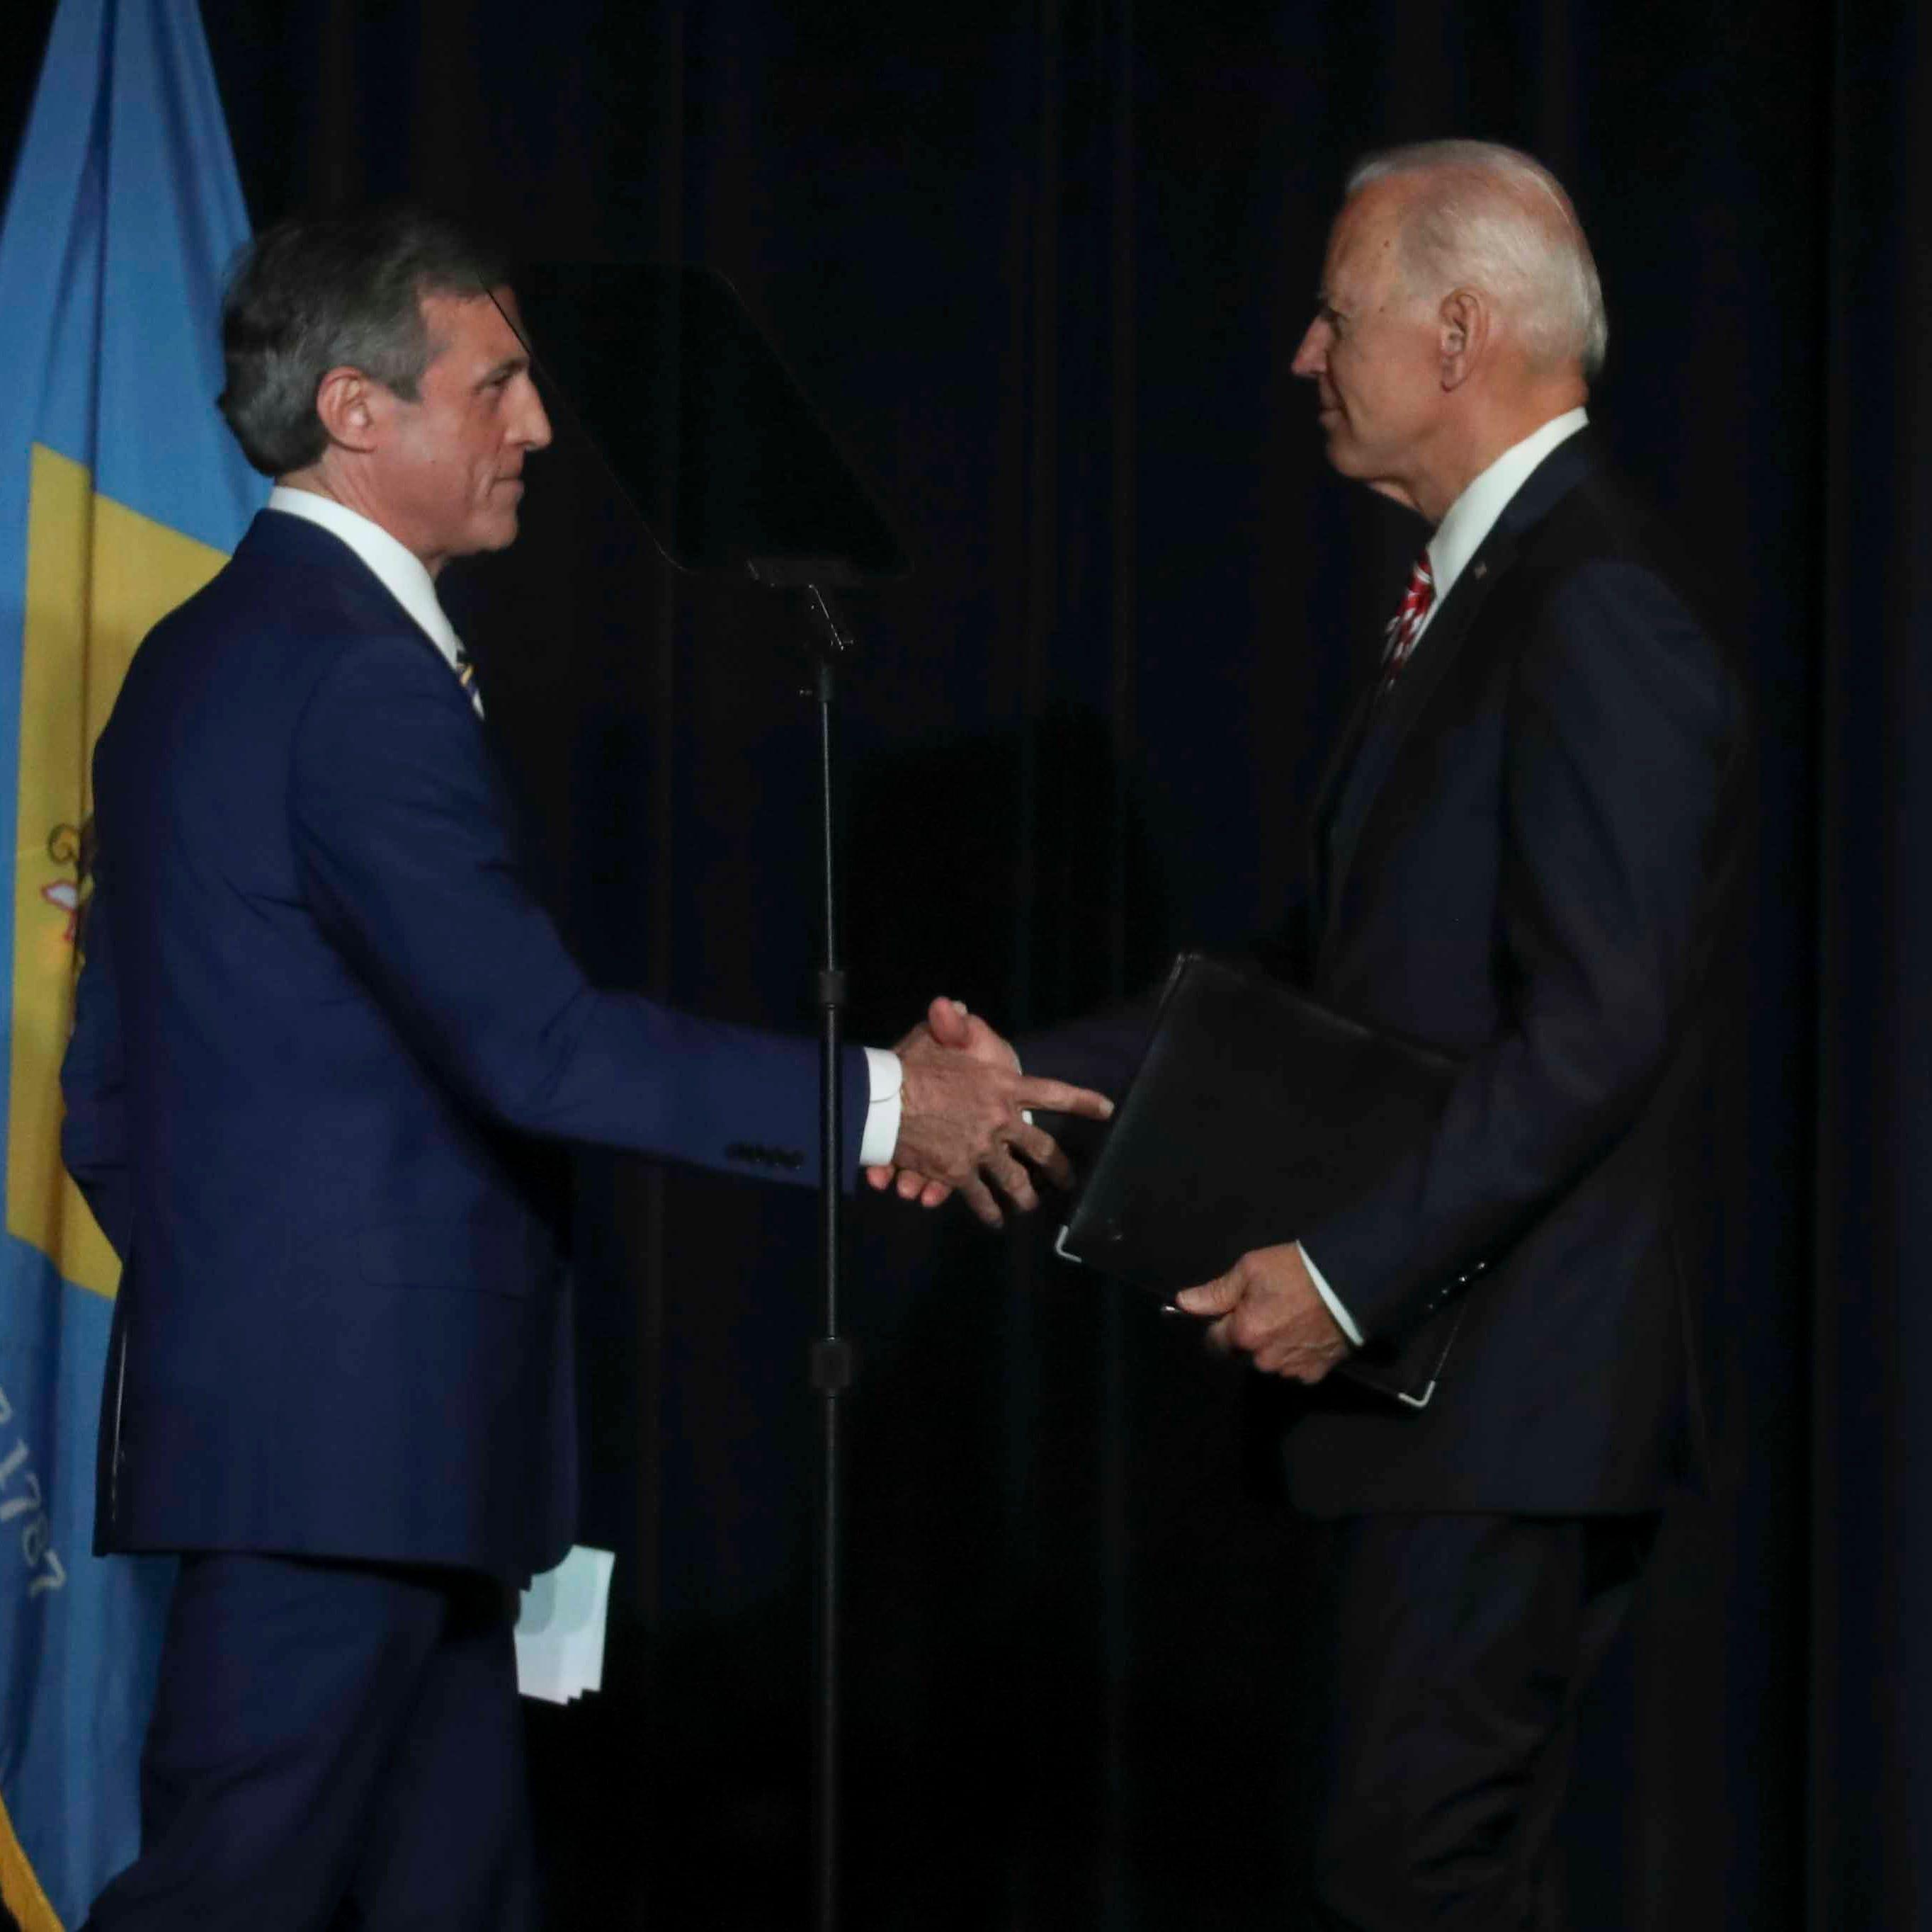 Delaware Gov. John Carney defends Joe Biden in town hall amid debate over unwanted touching